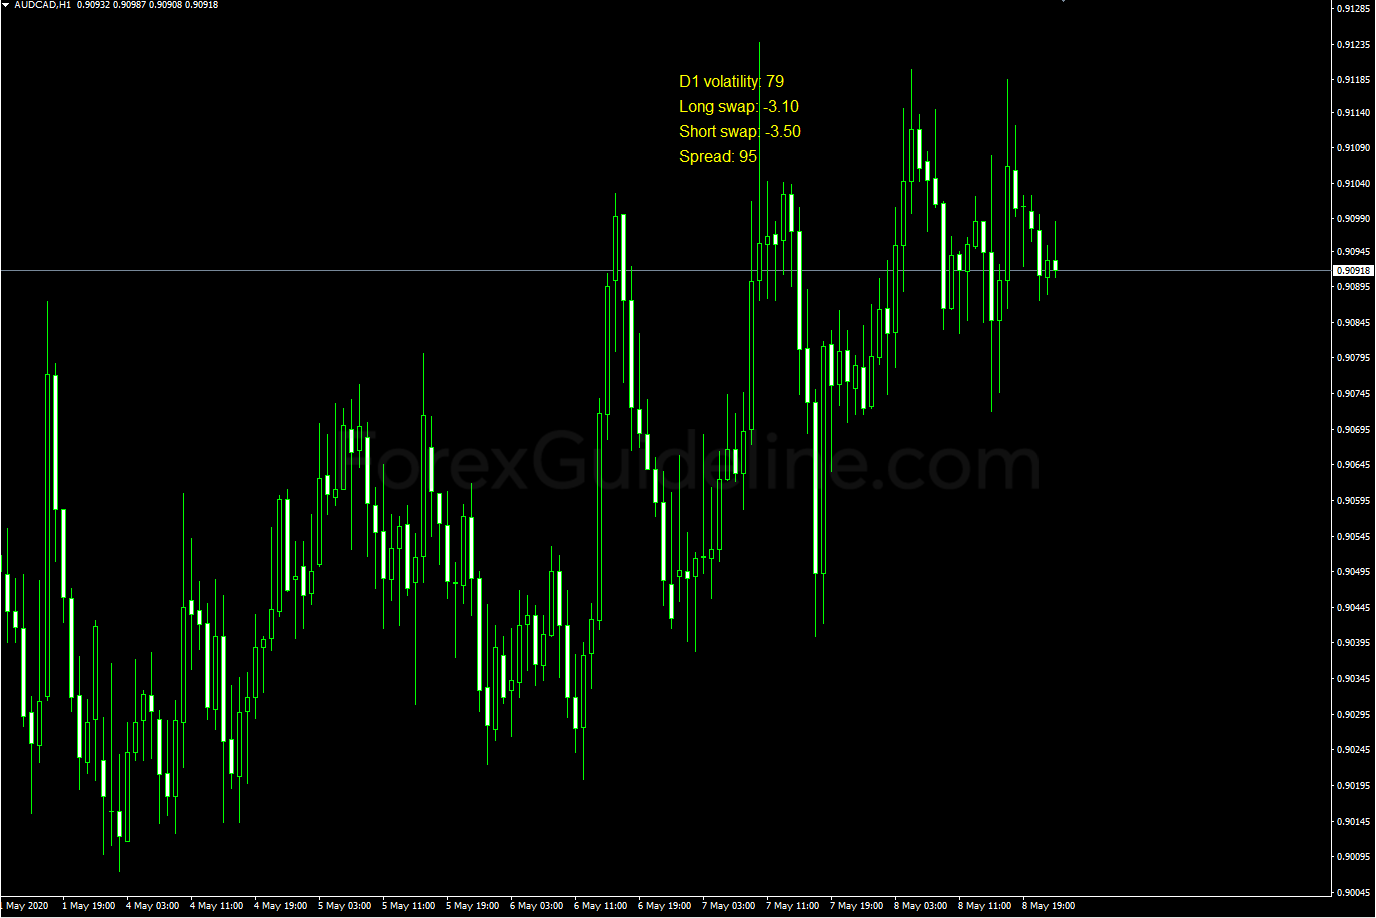 daily volatility